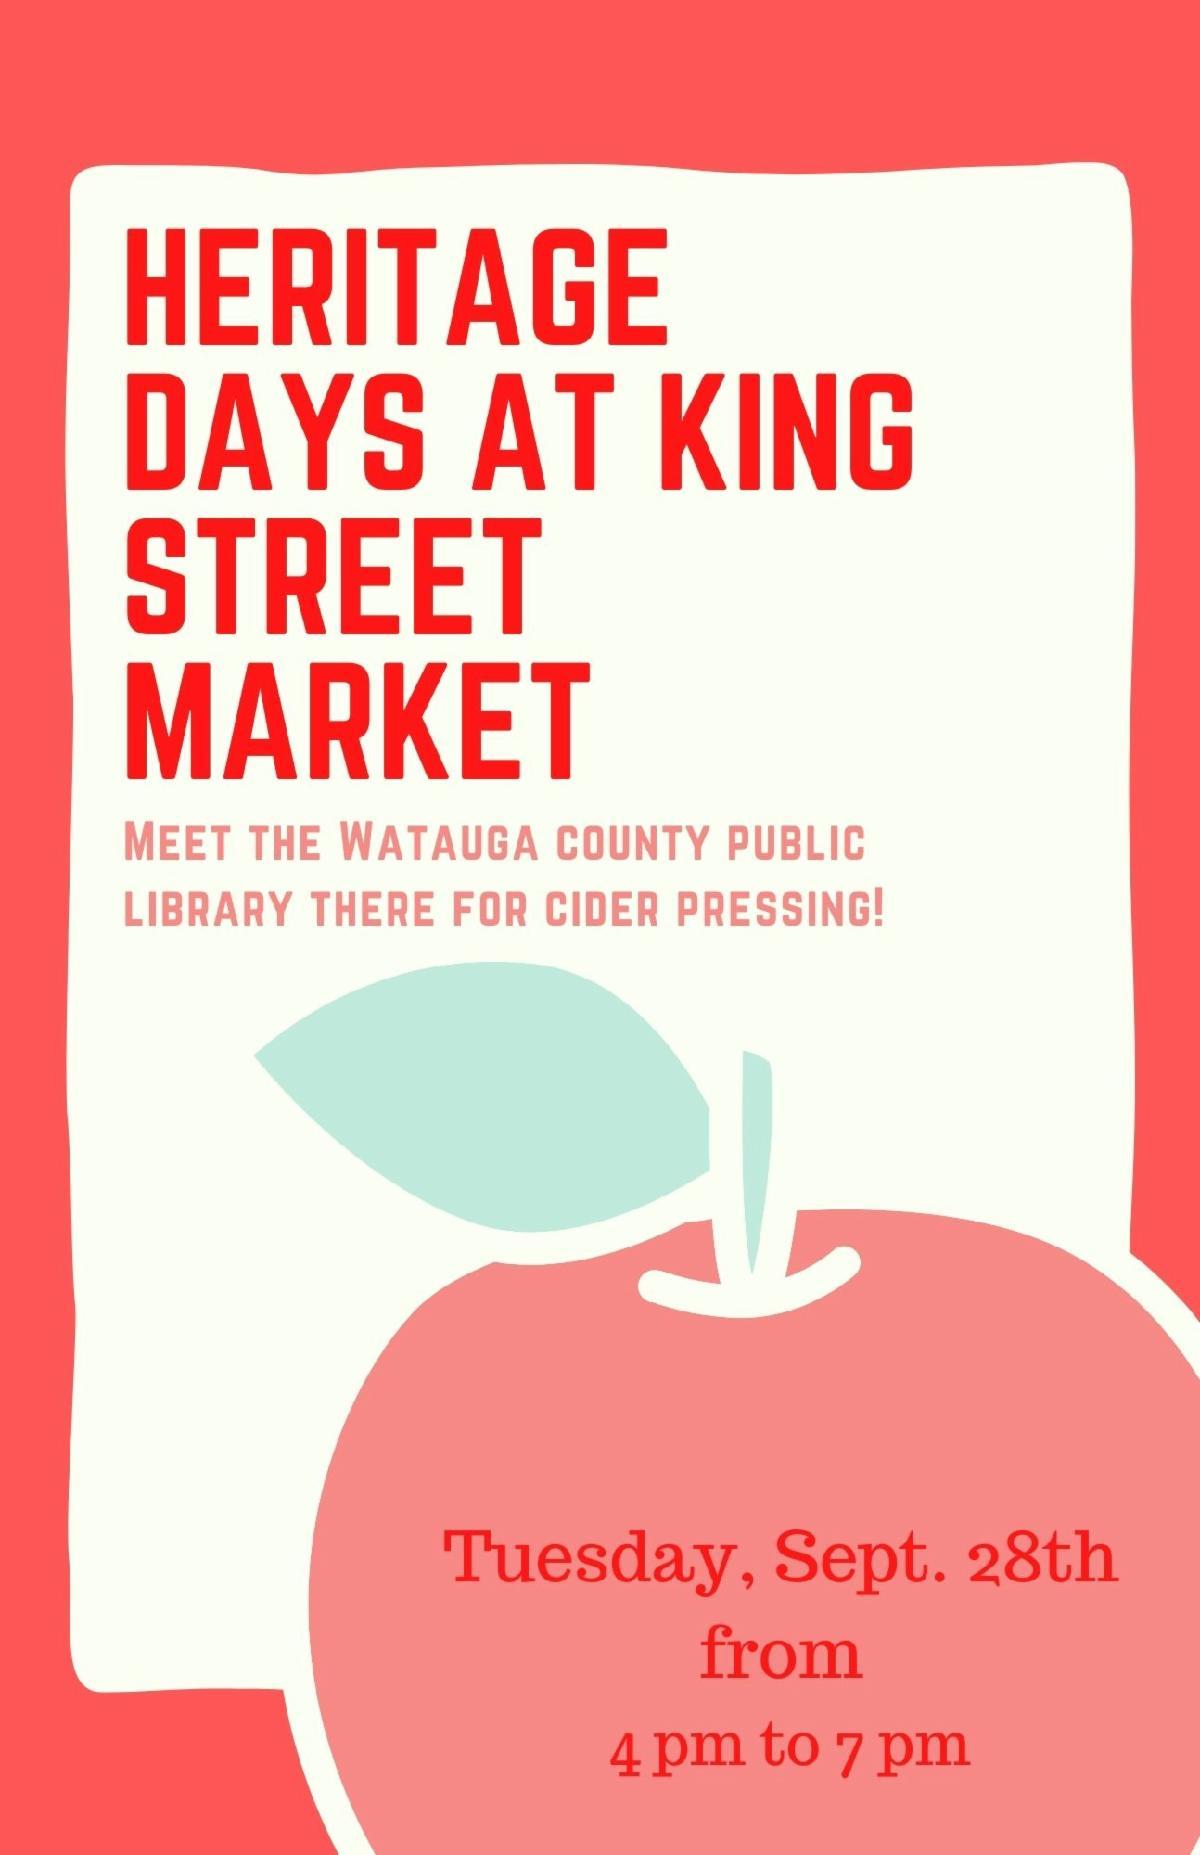 Heritage Days at King Street mrket.jpg